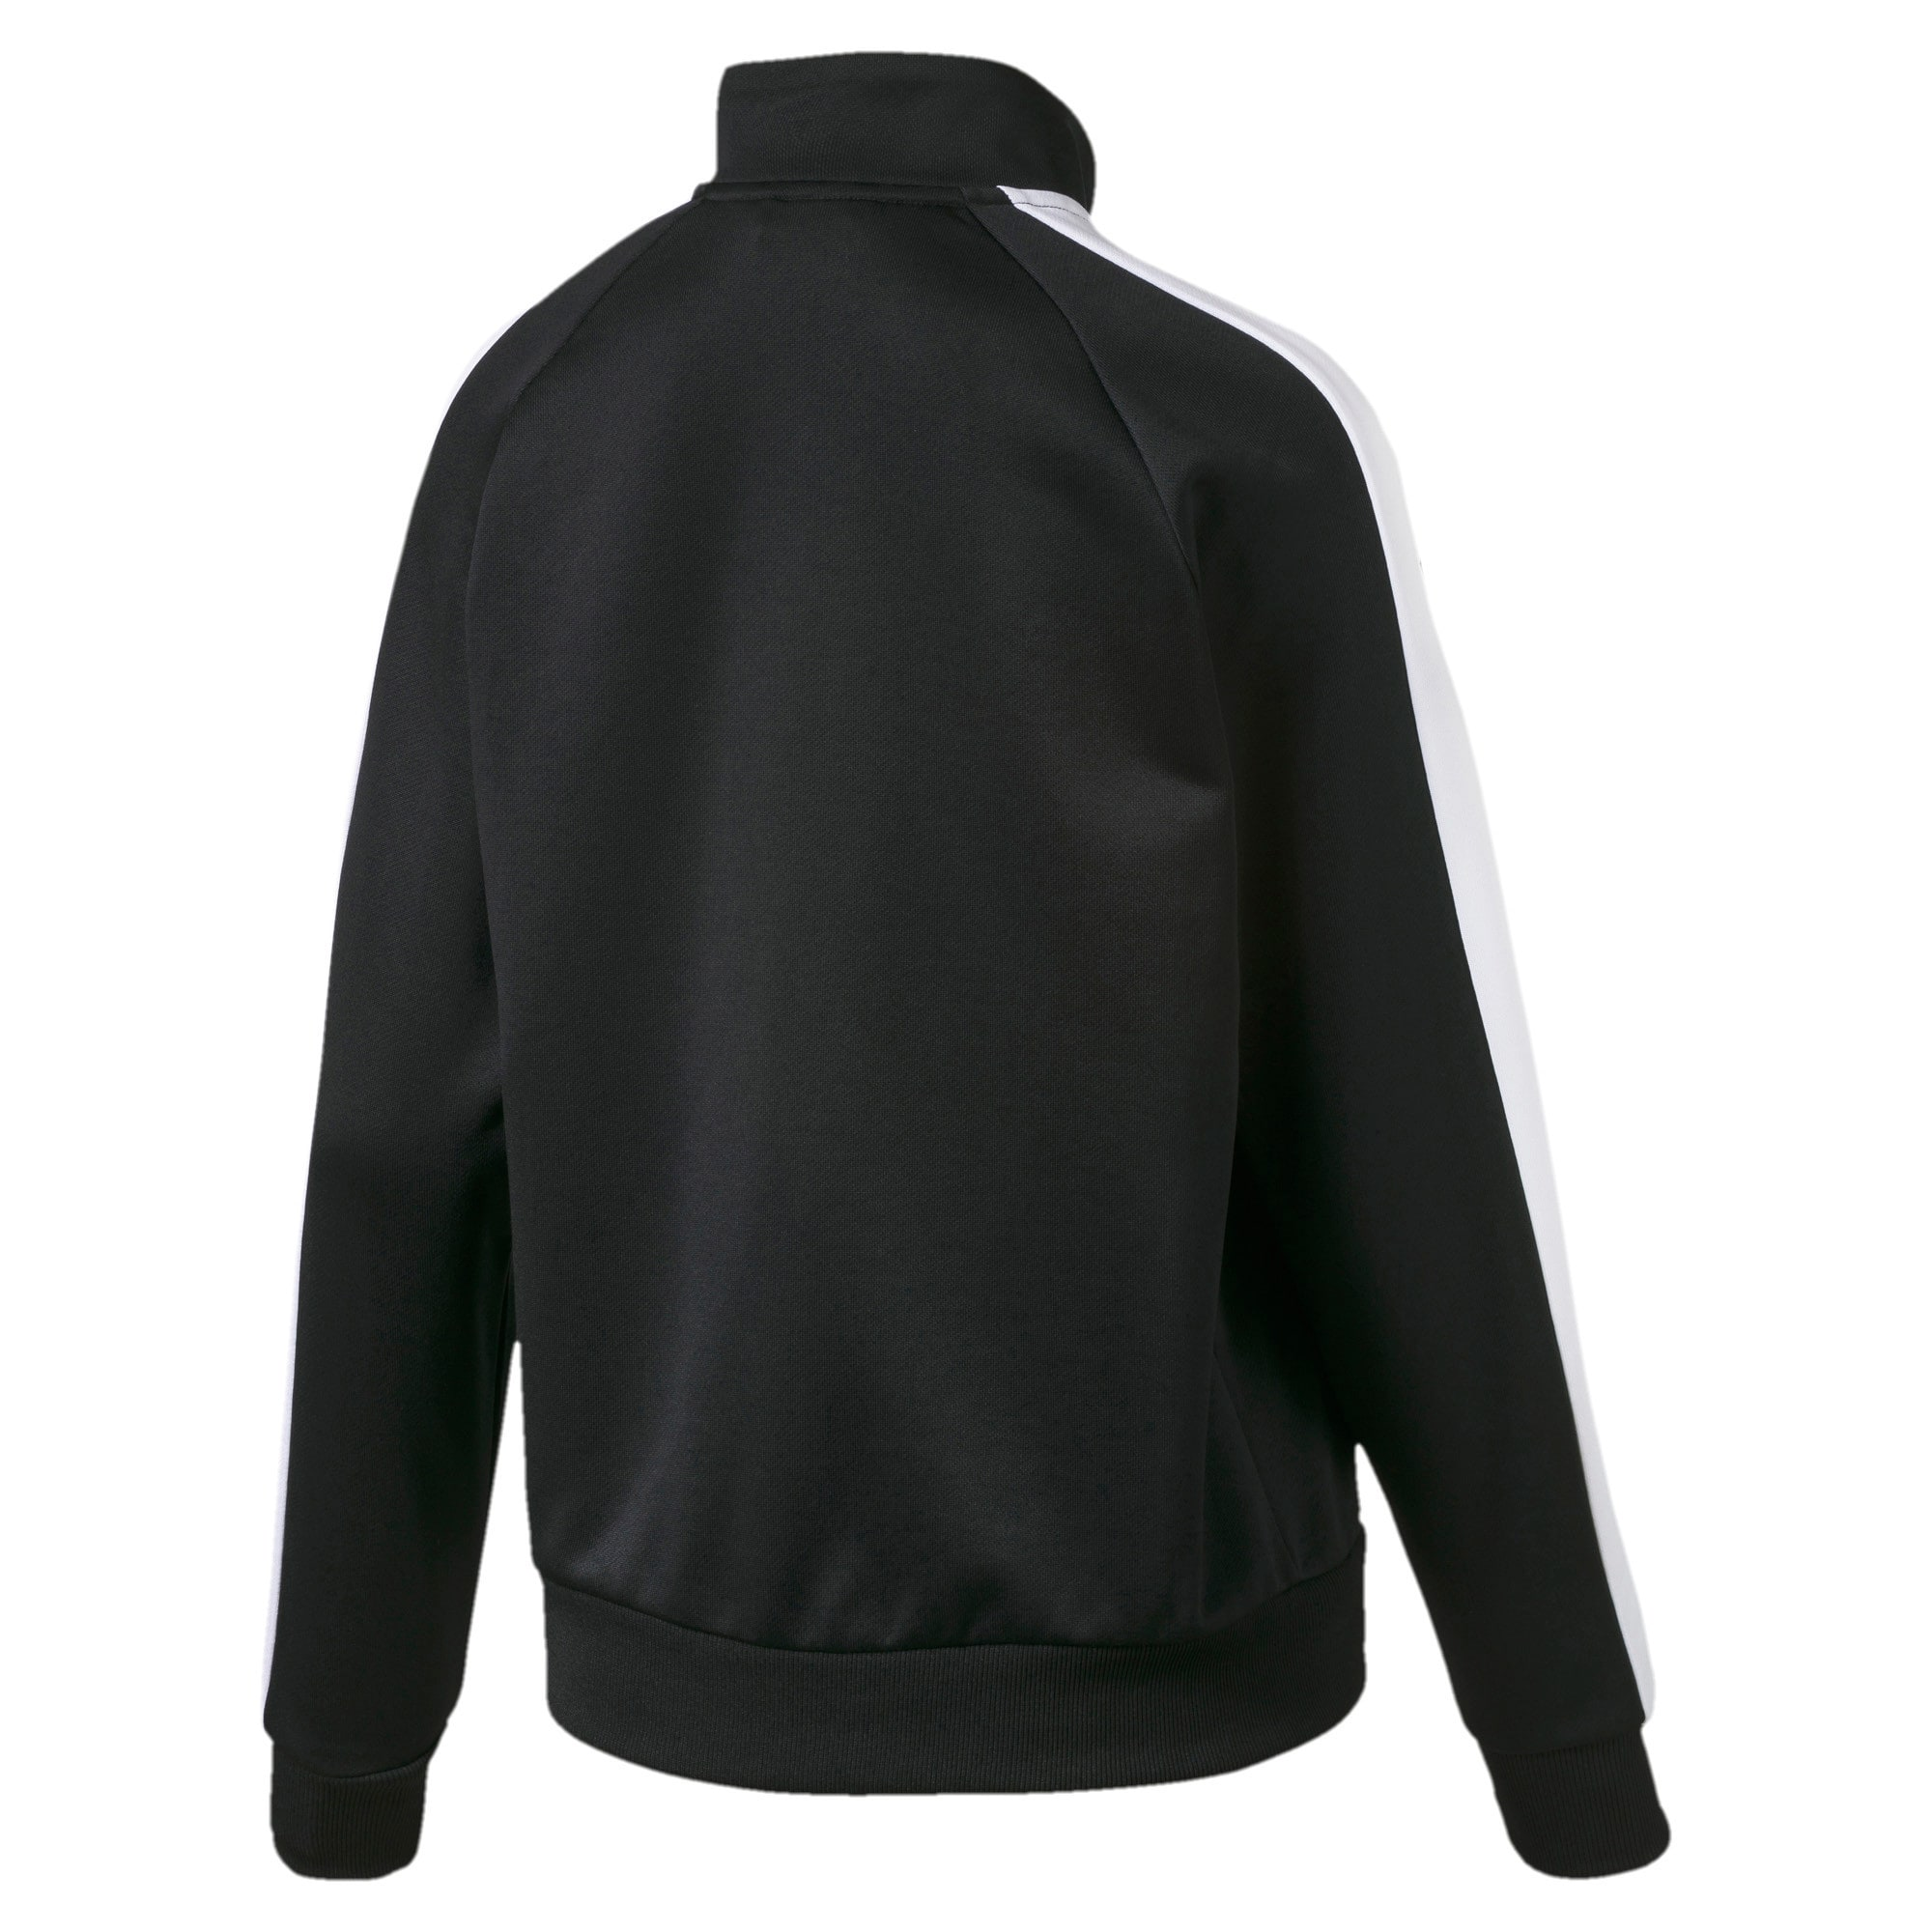 Thumbnail 5 of Classics T7 PT Women's Track Jacket, Puma Black-1, medium-IND